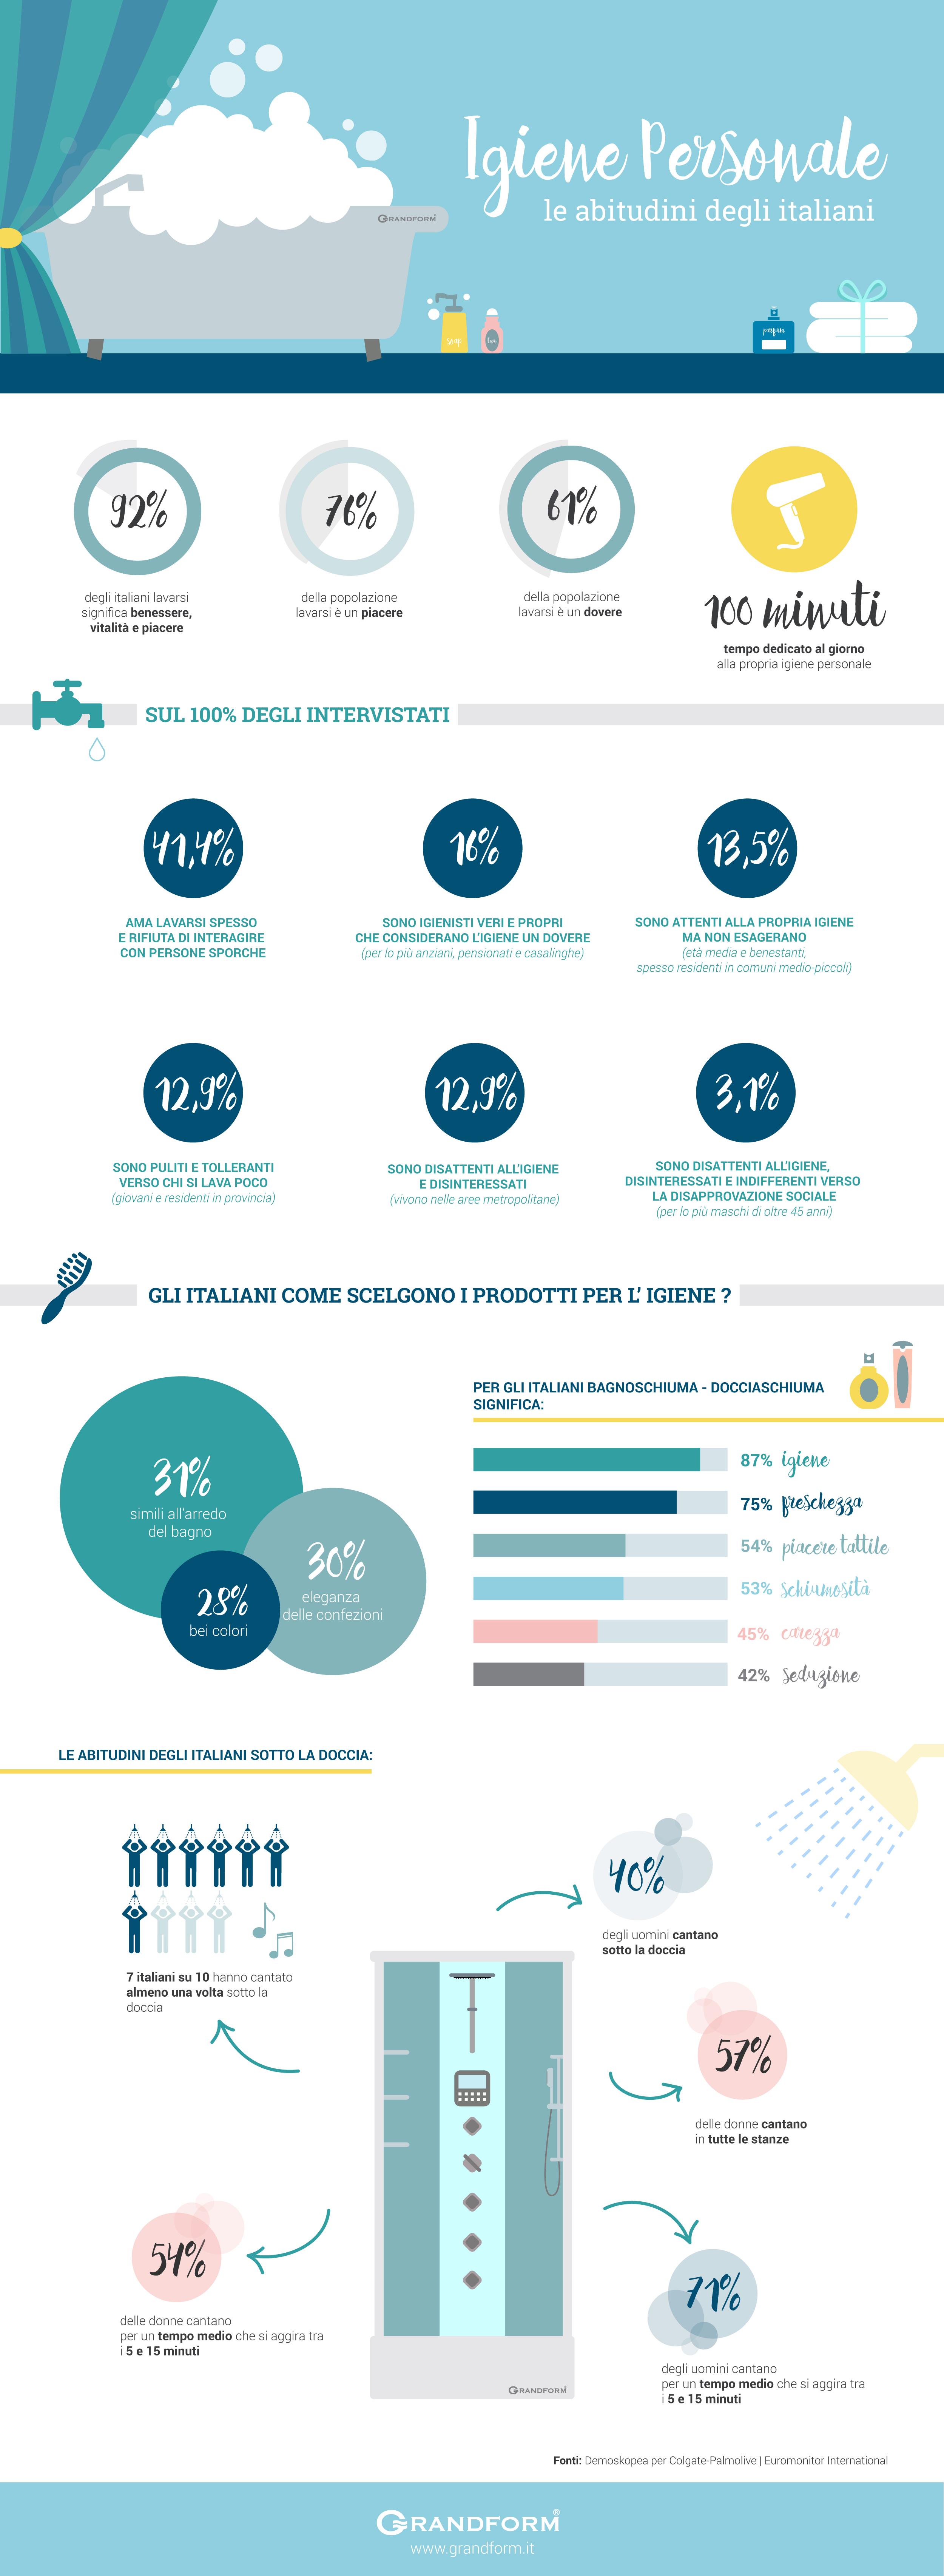 infografica-grandform-1_di_3